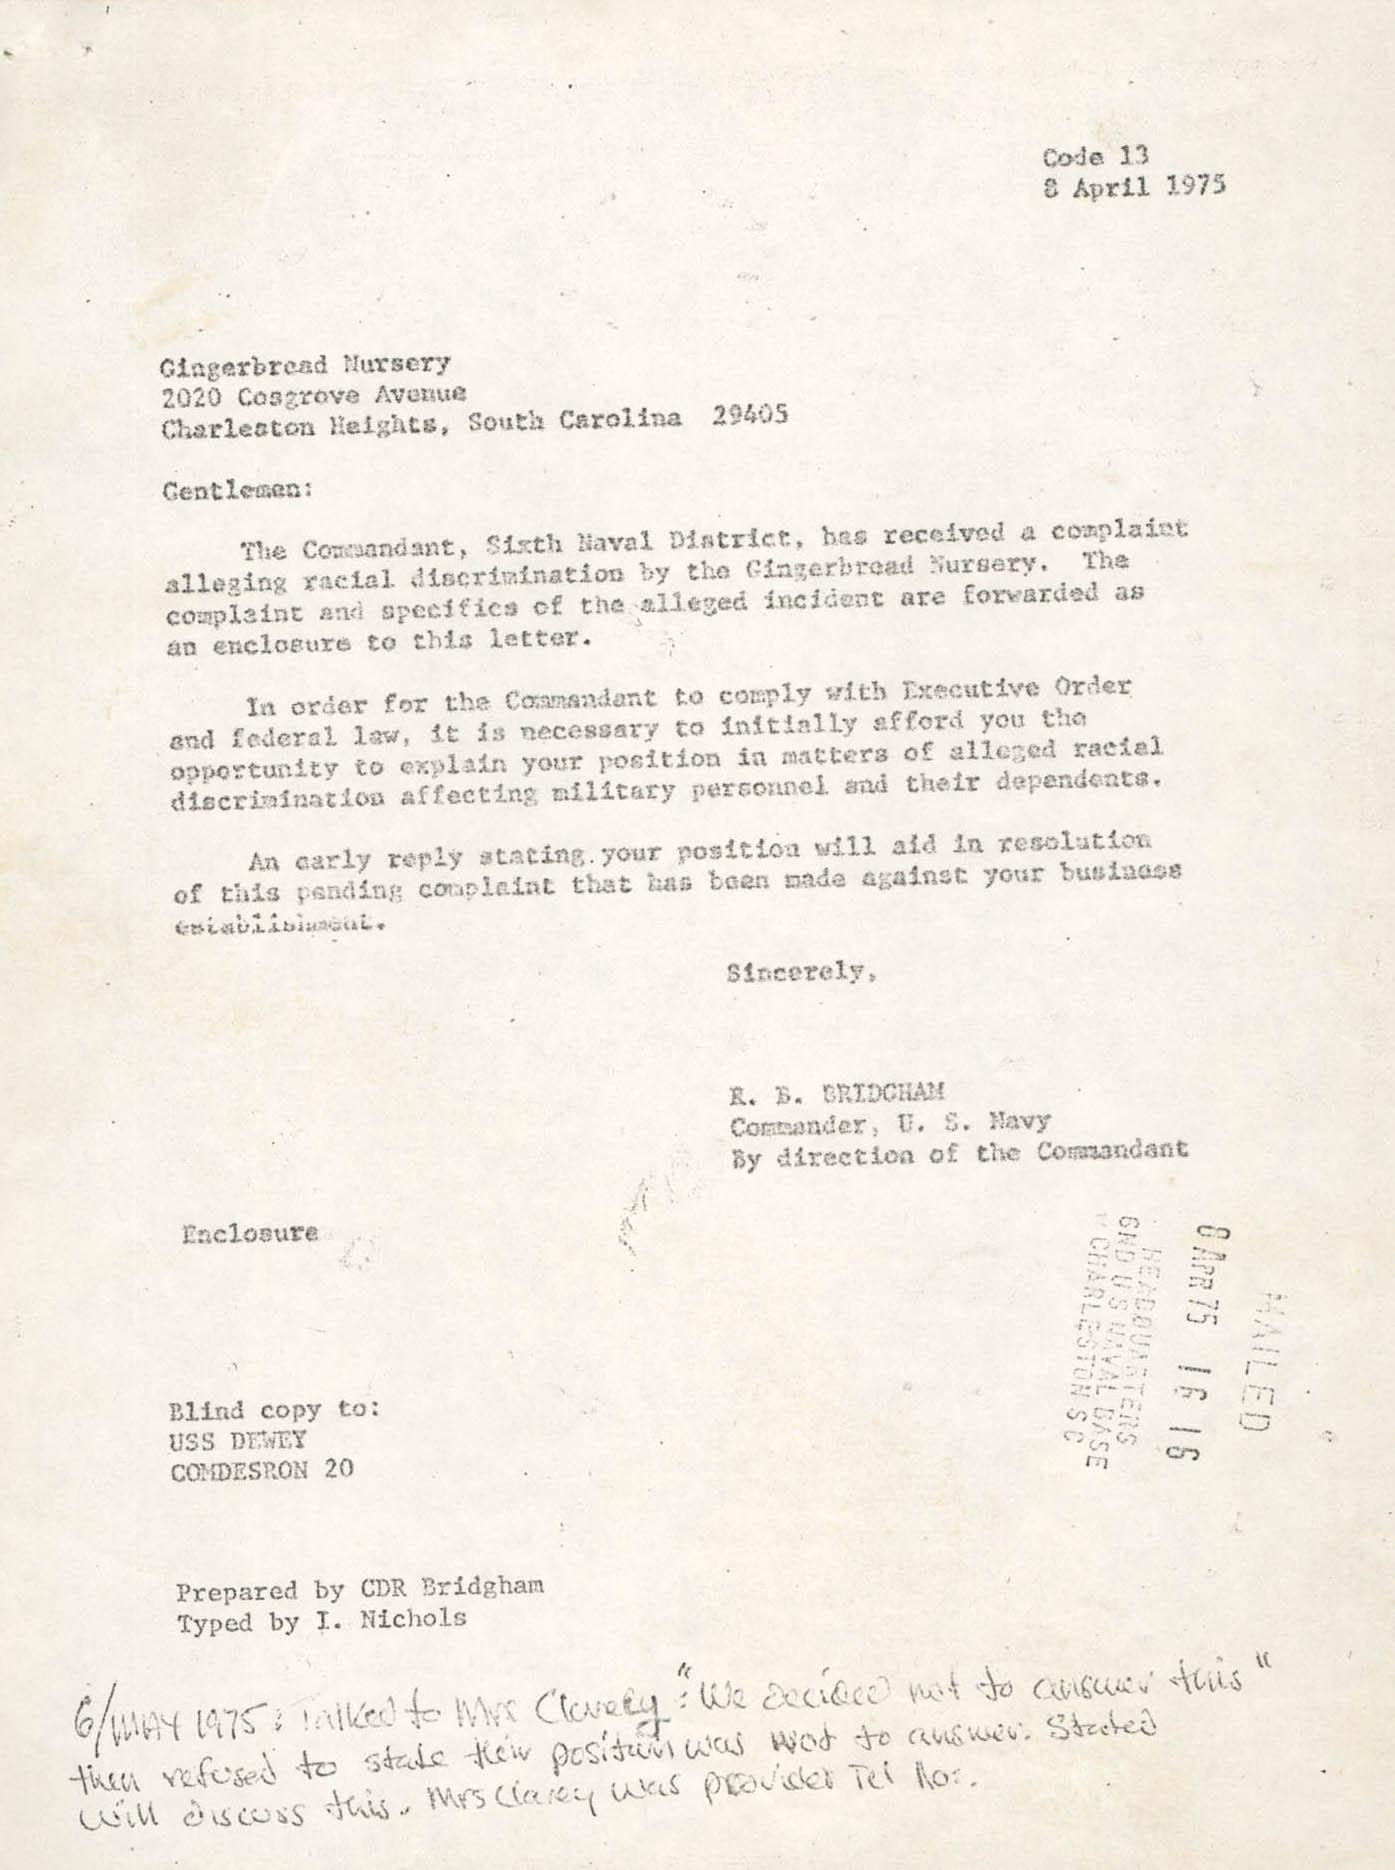 Letter from R. B. Bridgham, April 8, 1975